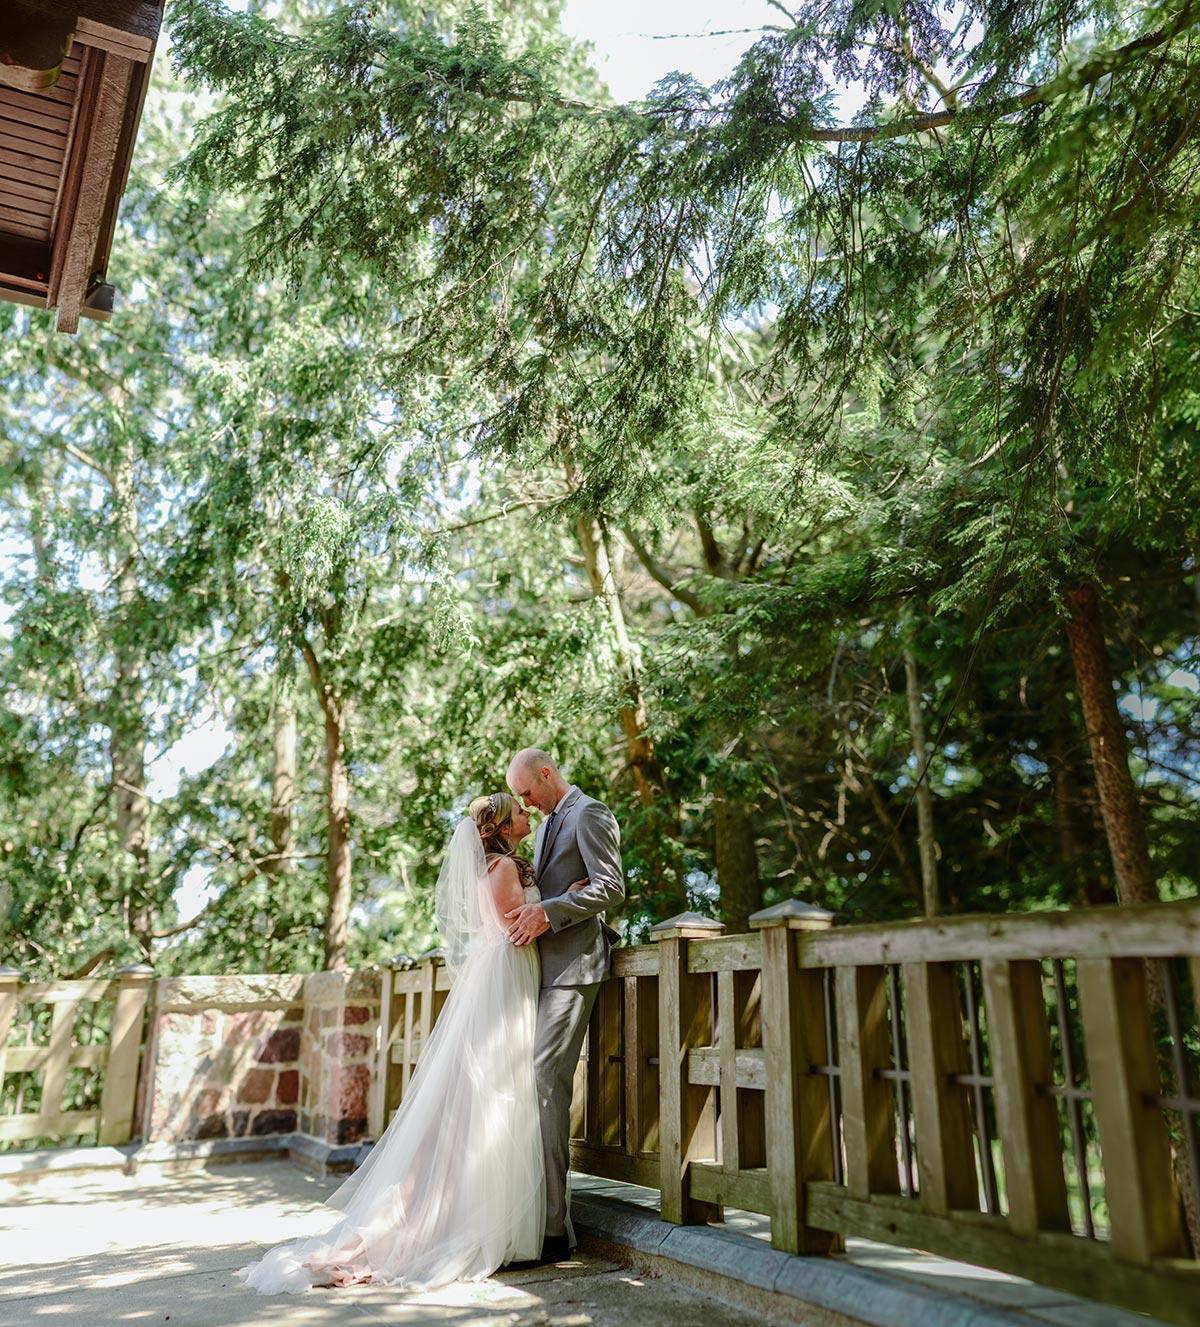 panorama of bride and groom Outdoor Minneapolis Wedding